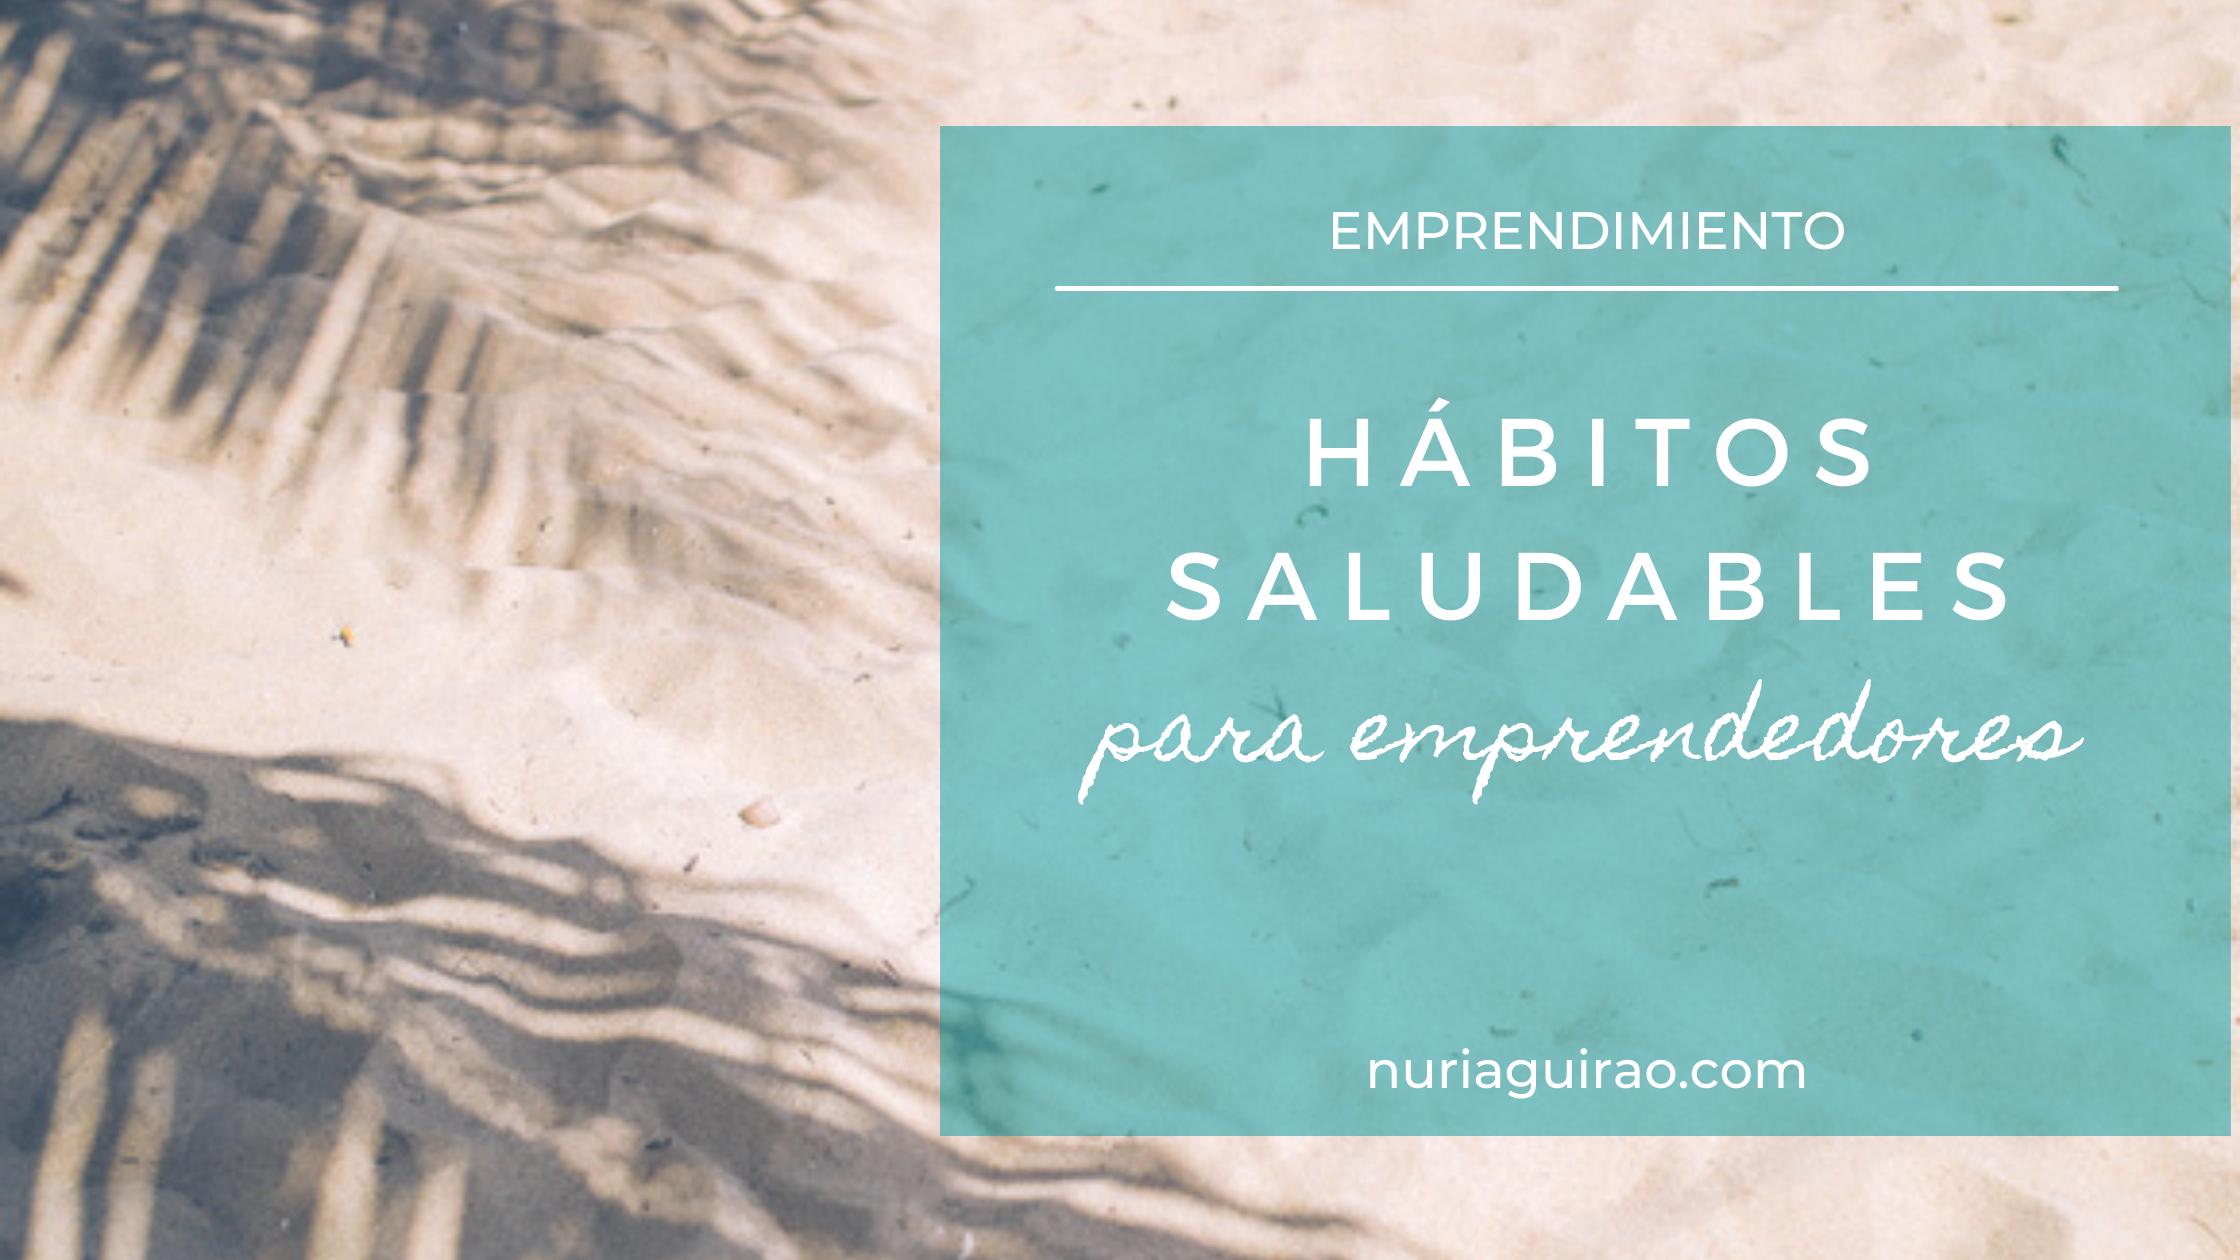 Hábitos saludables para emprendedores